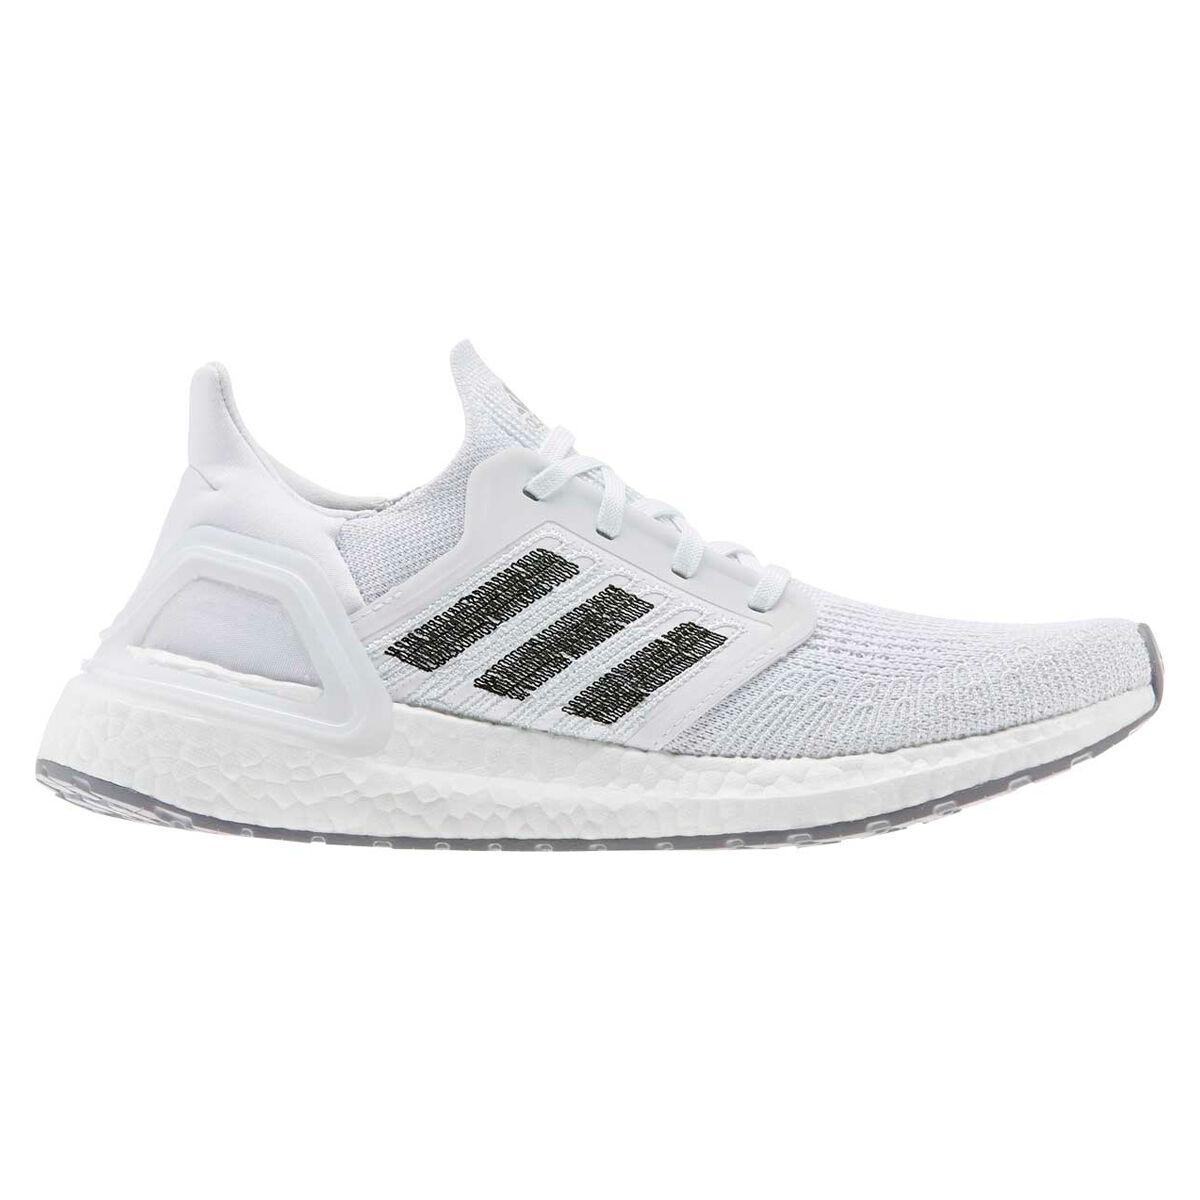 adidas ultra boost white 9.5